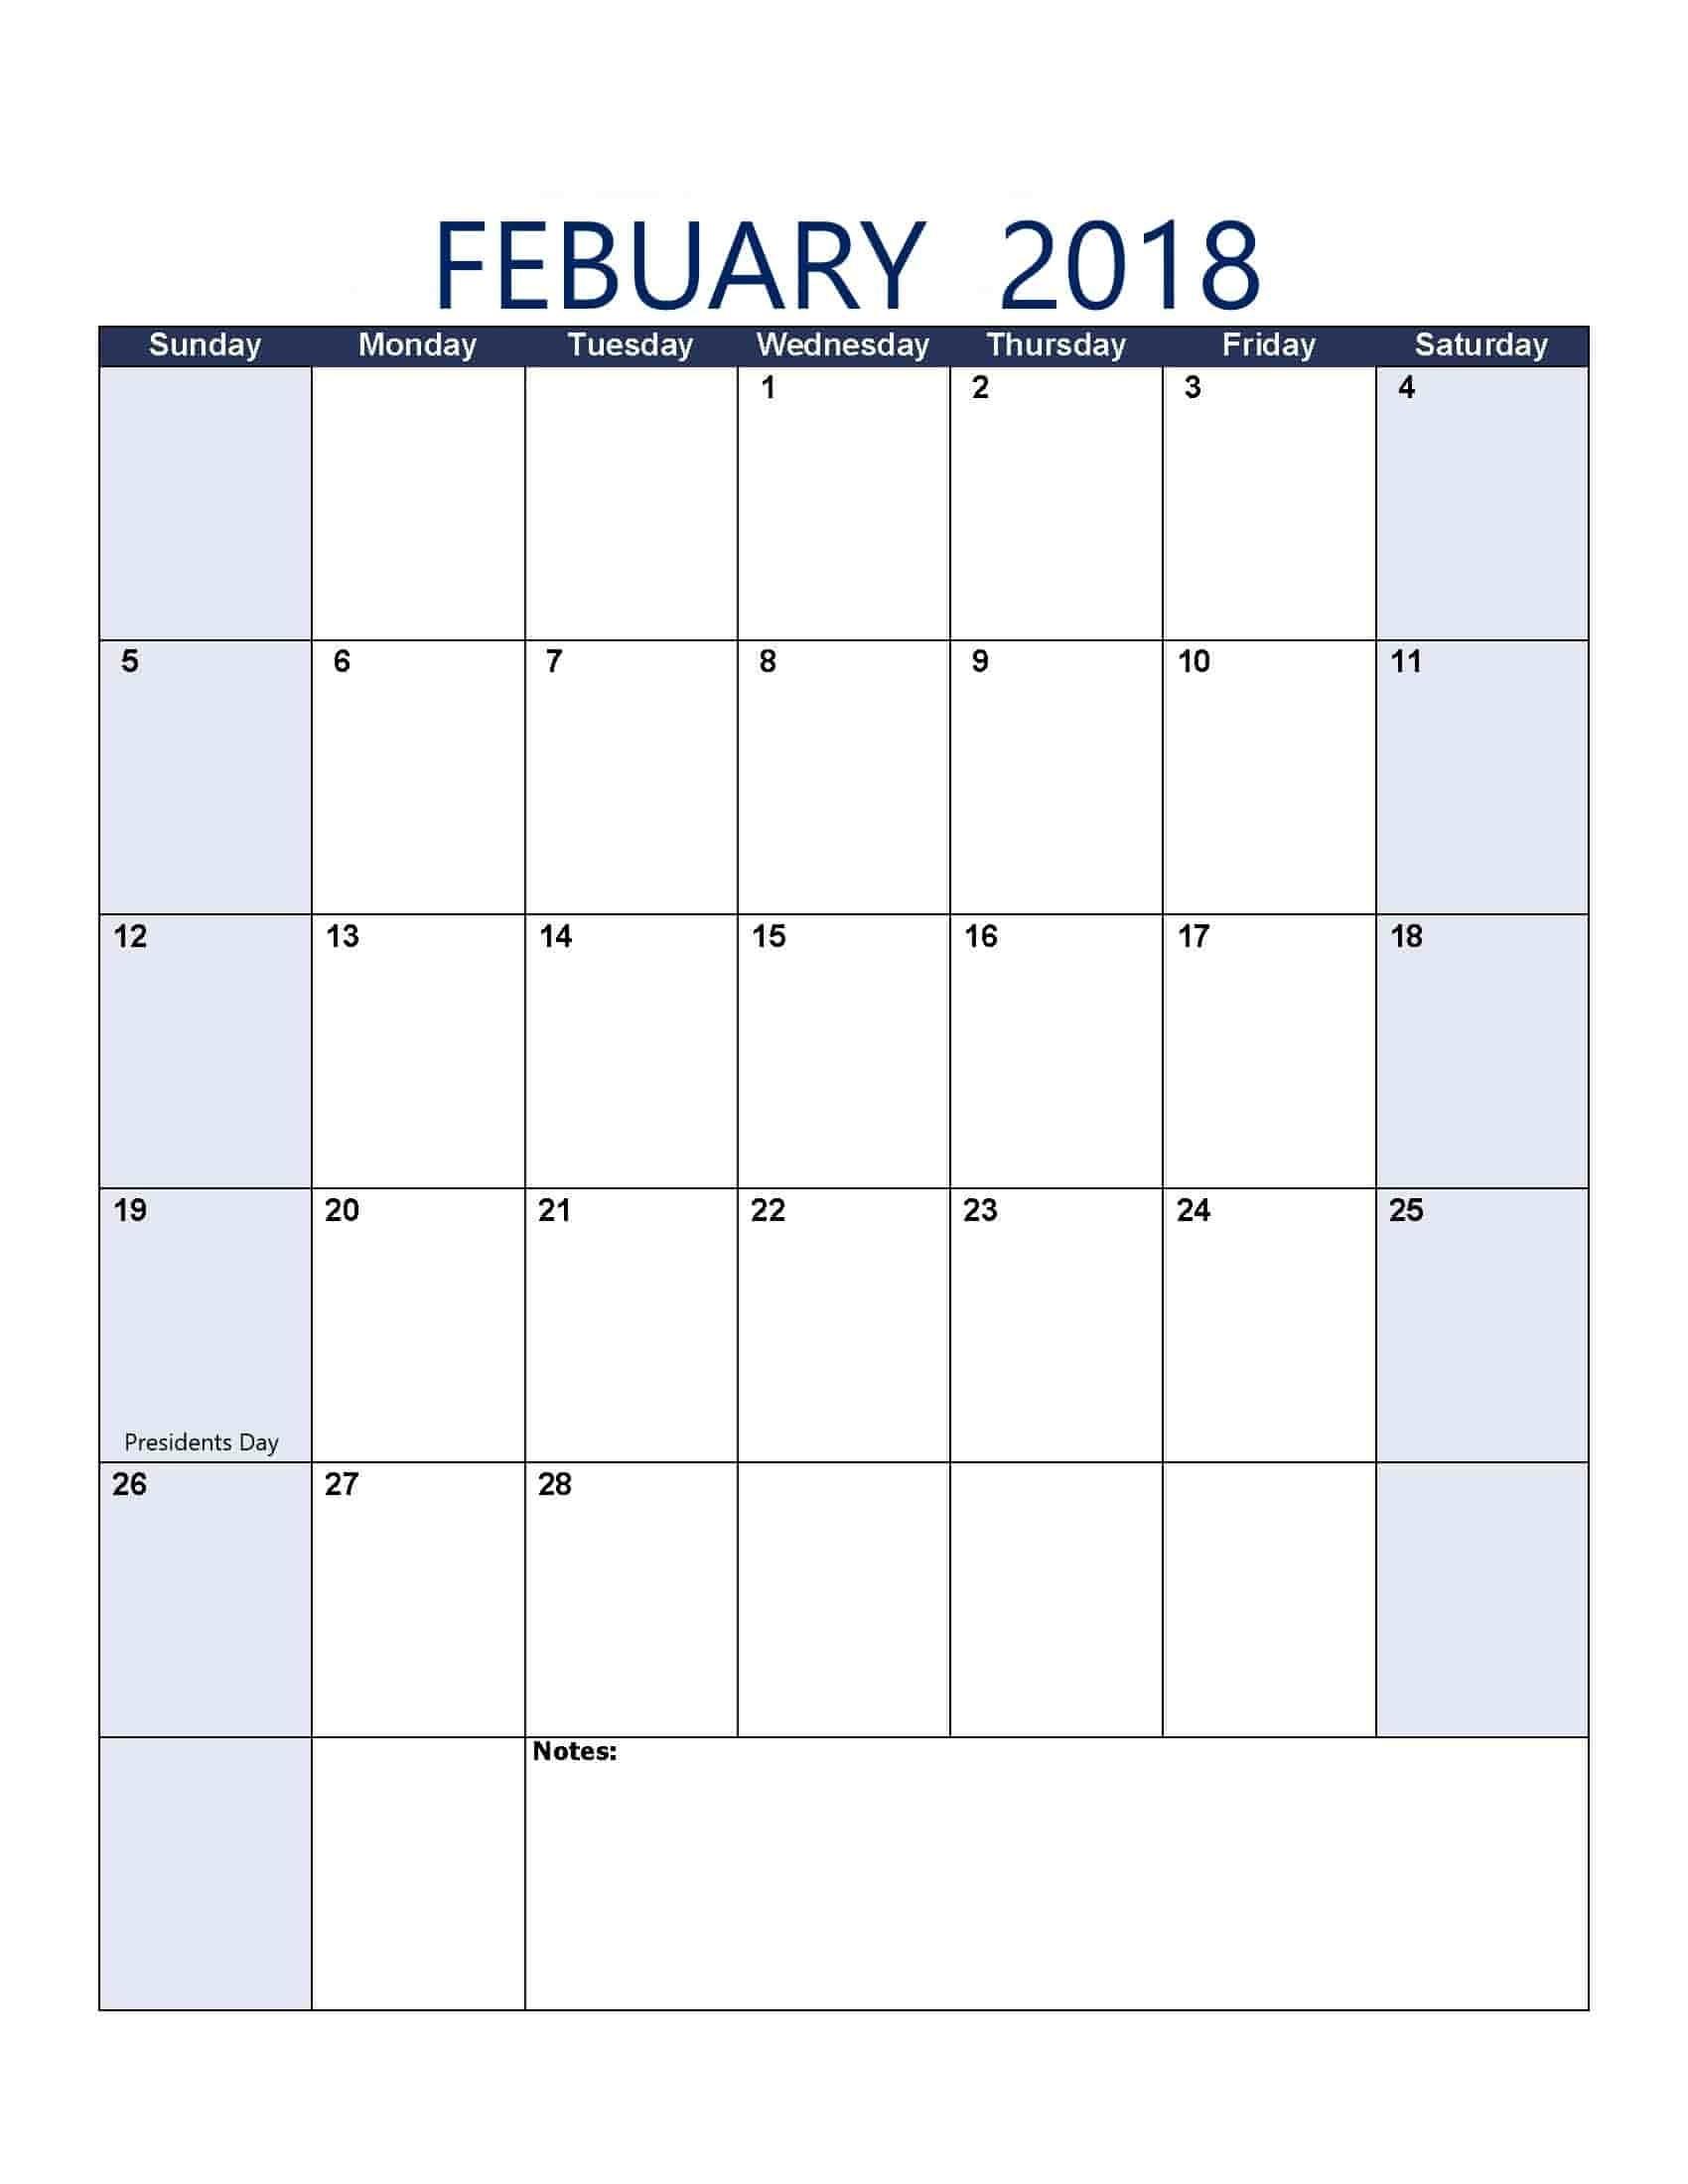 February 2018 Calendar - Free, Printable Calendar Templates-8.5 X 14 Calendar Template